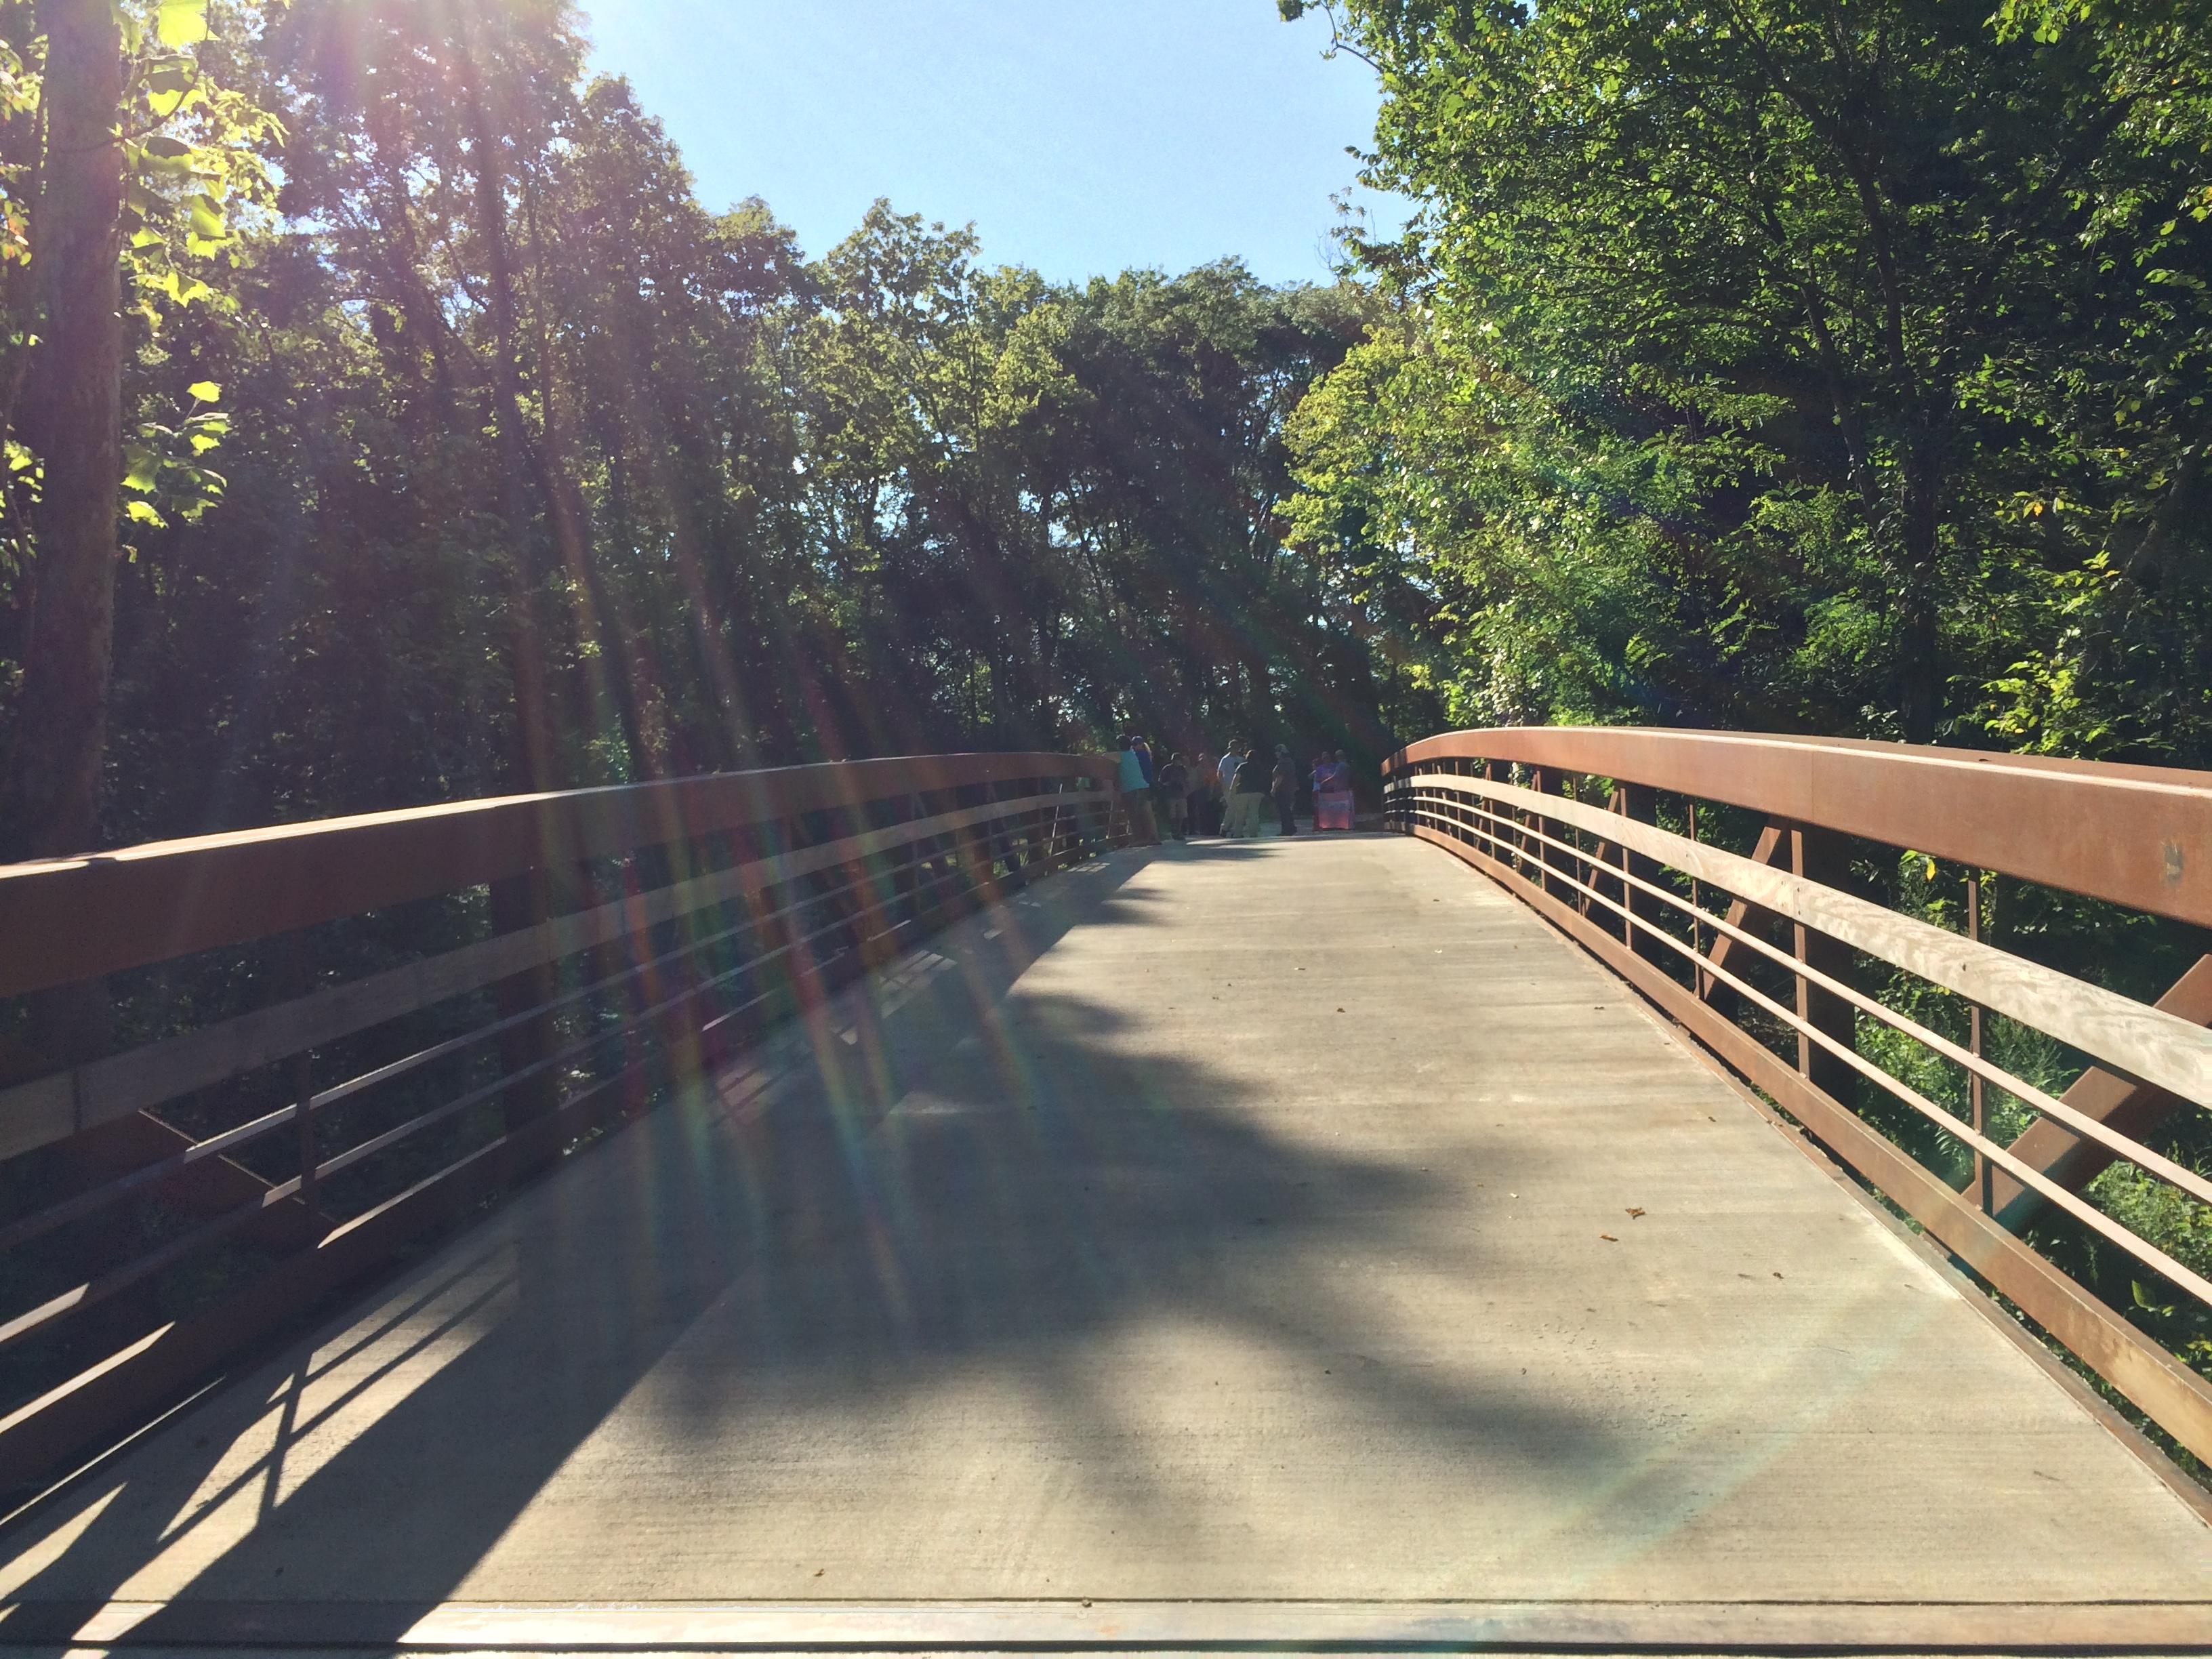 Leavenworth County Pedestrian and Bi